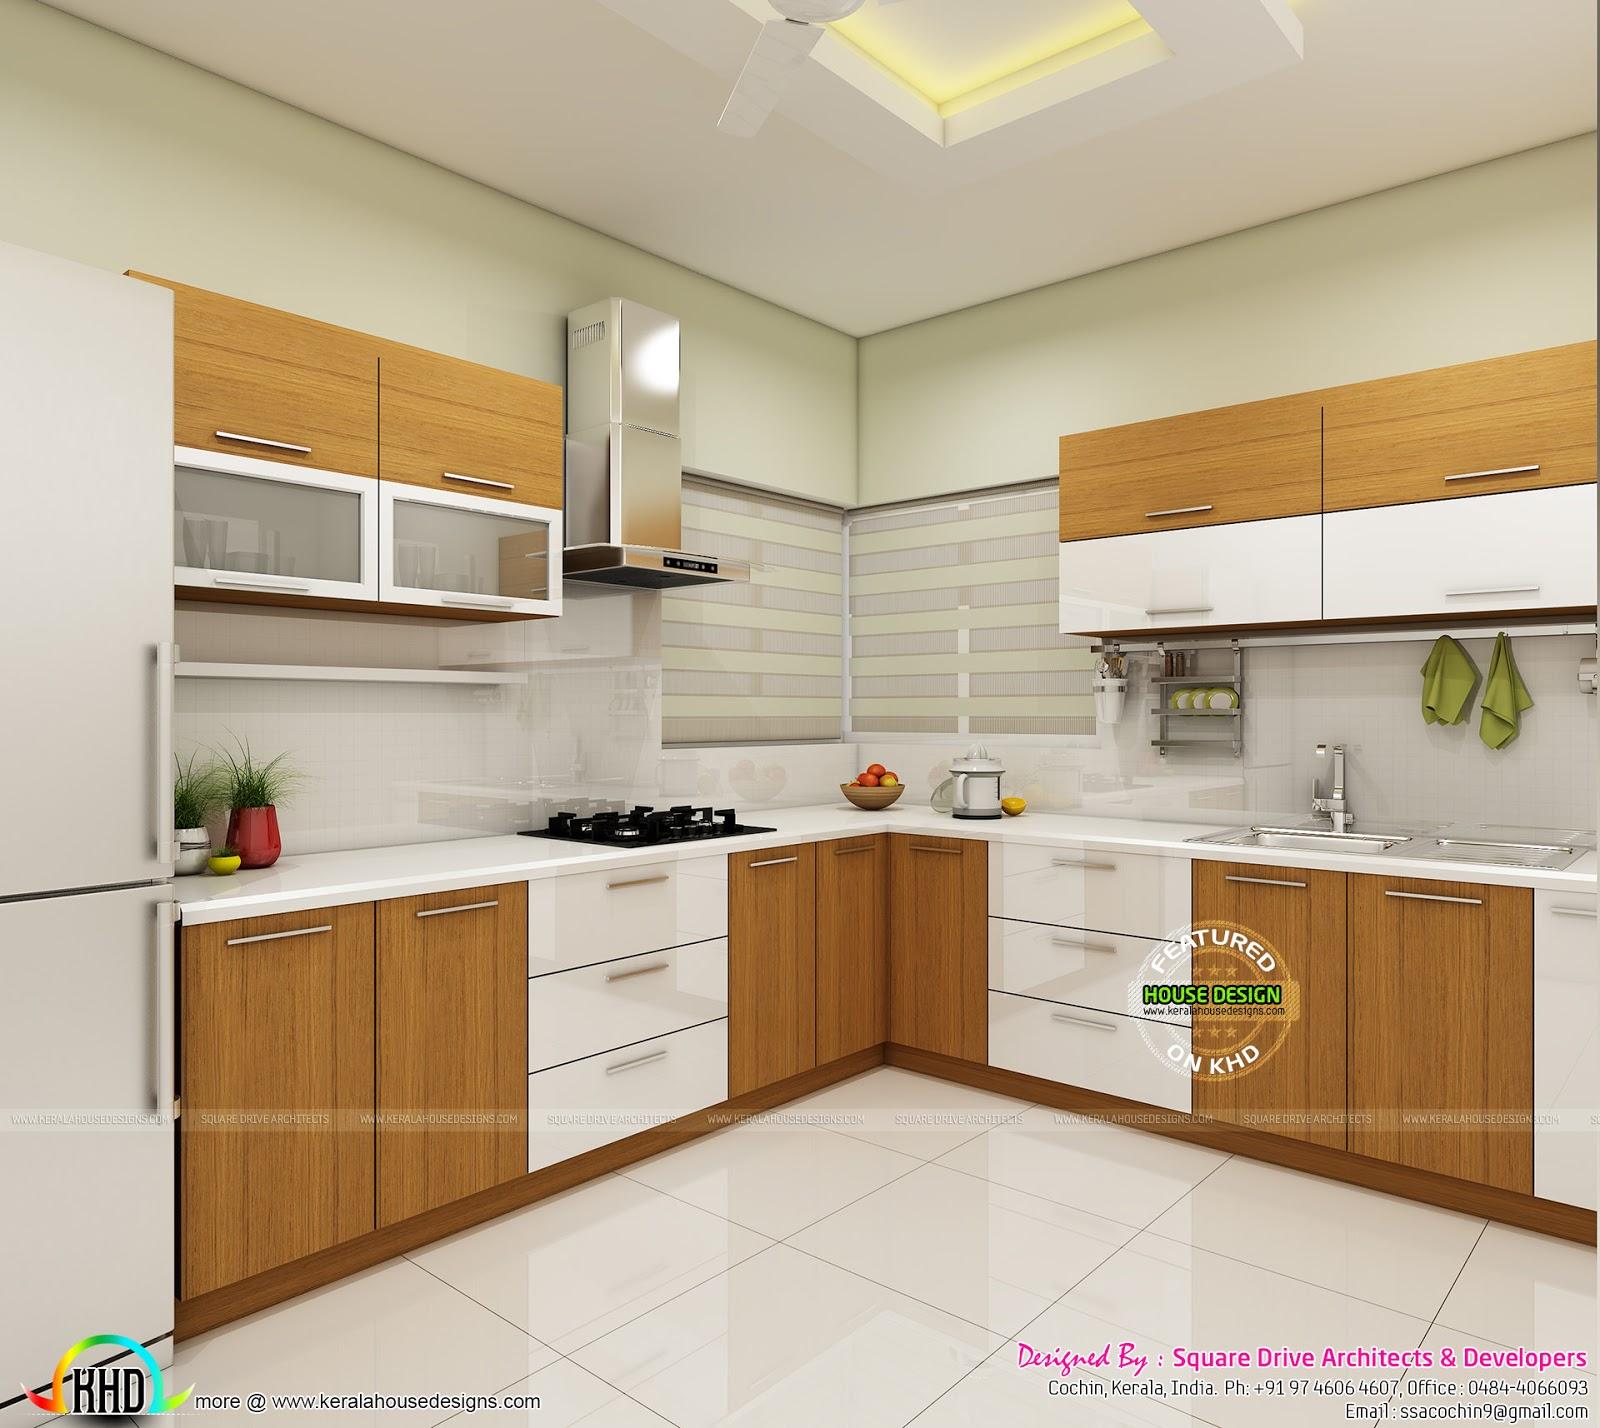 Modern home interiors of bedroom, dining, kitchen - Kerala ...